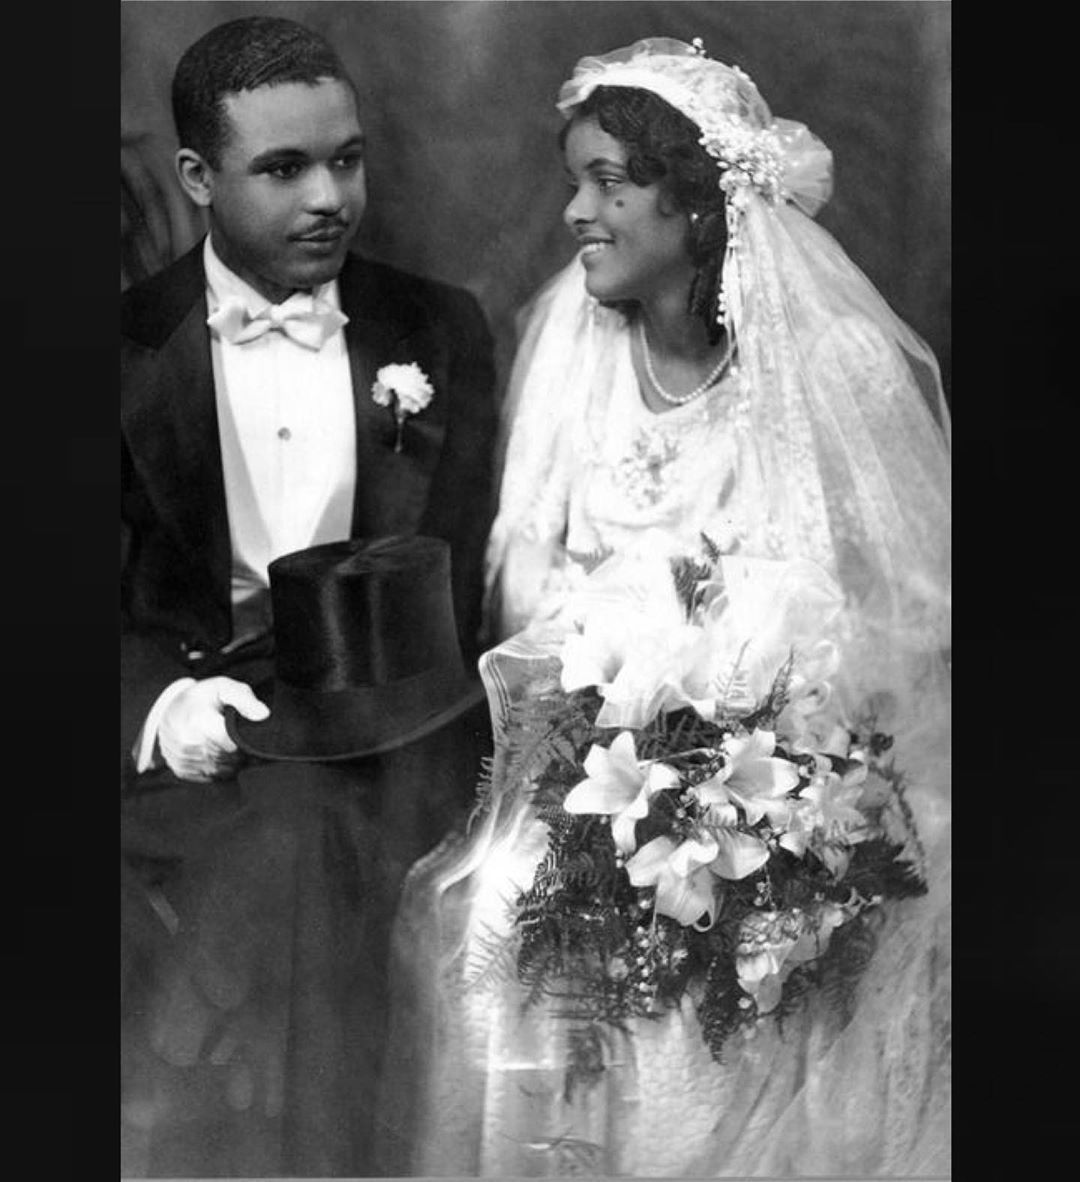 1 525 Likes 33 Comments Ephemeral Elegance Ephemeral Elegance On Instagram Bride And In 2020 African American Brides African American Weddings Vintage Wedding